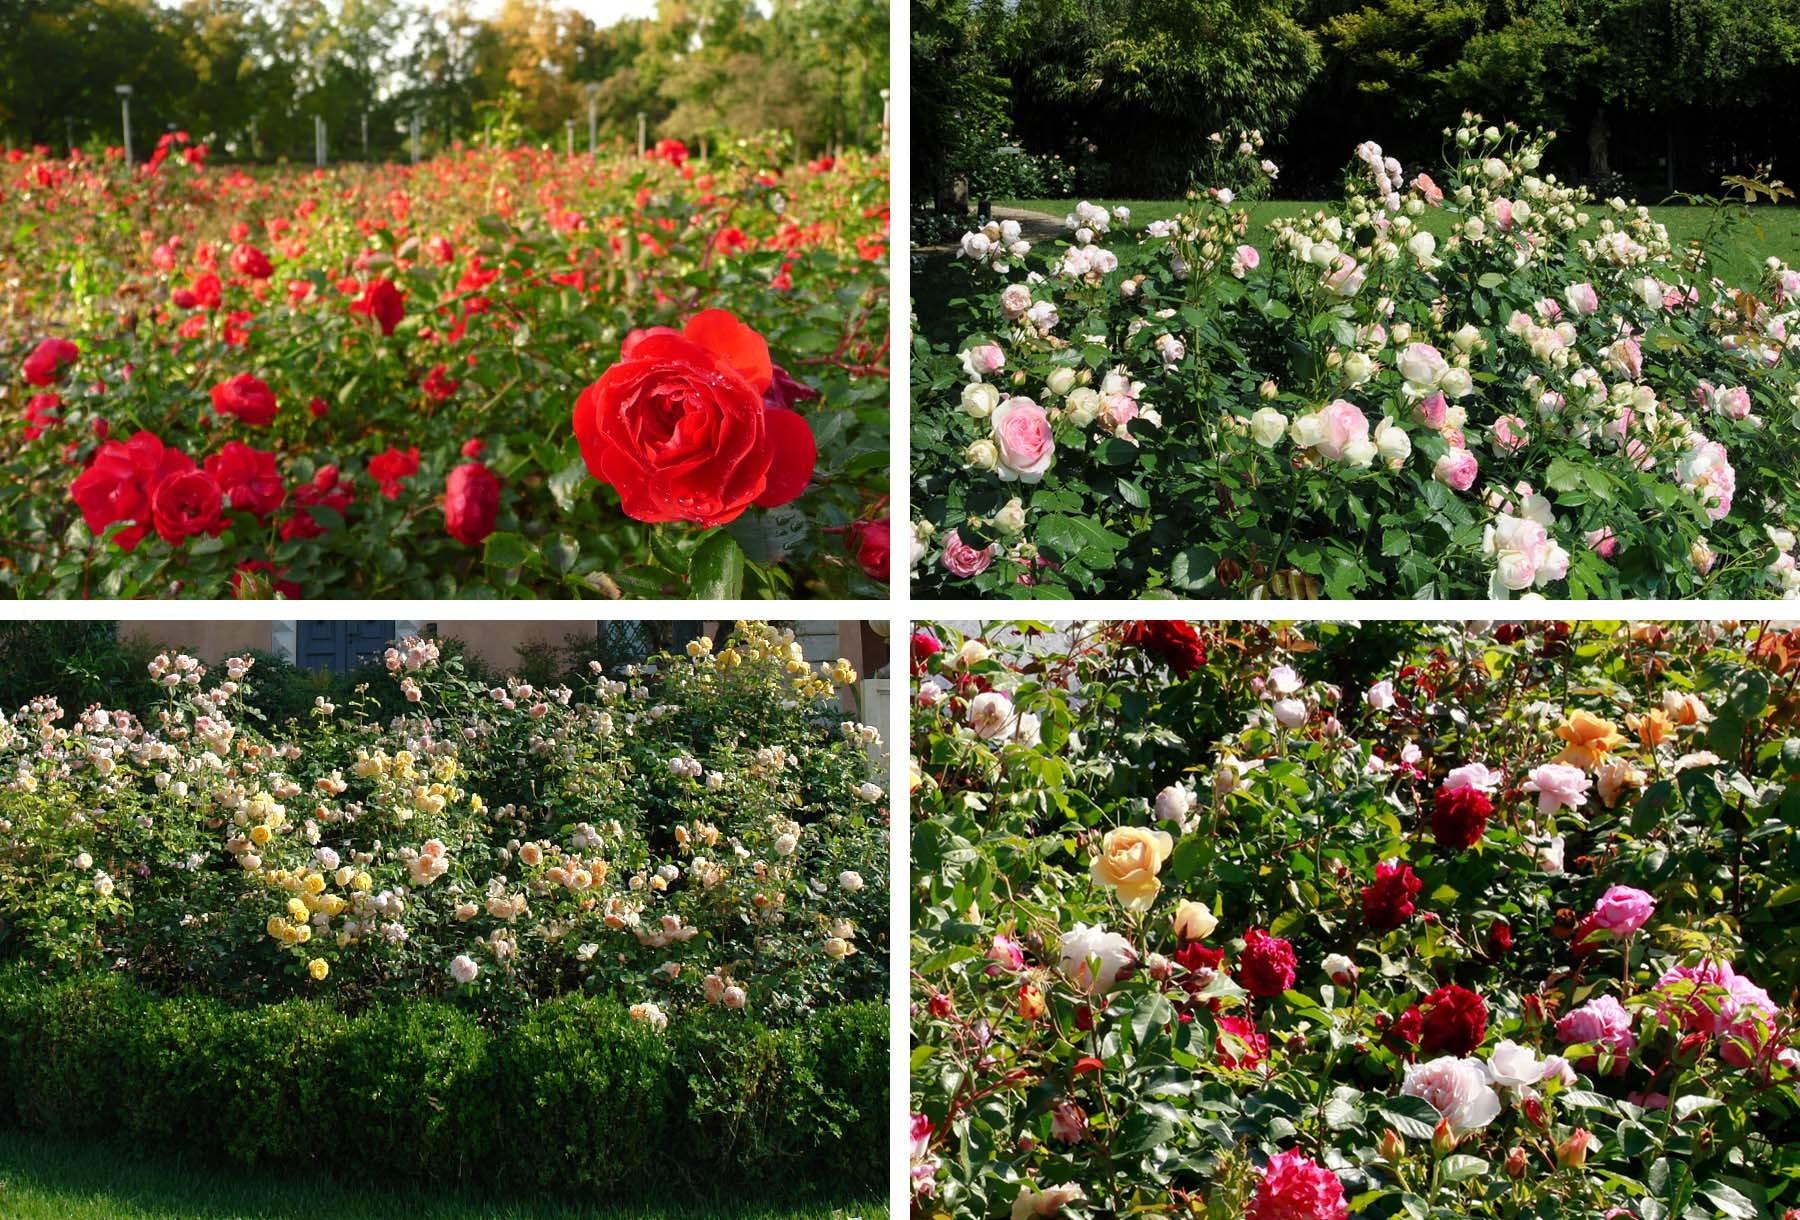 An Italian garden in China - فضاهای عمومی و شهربازی ها